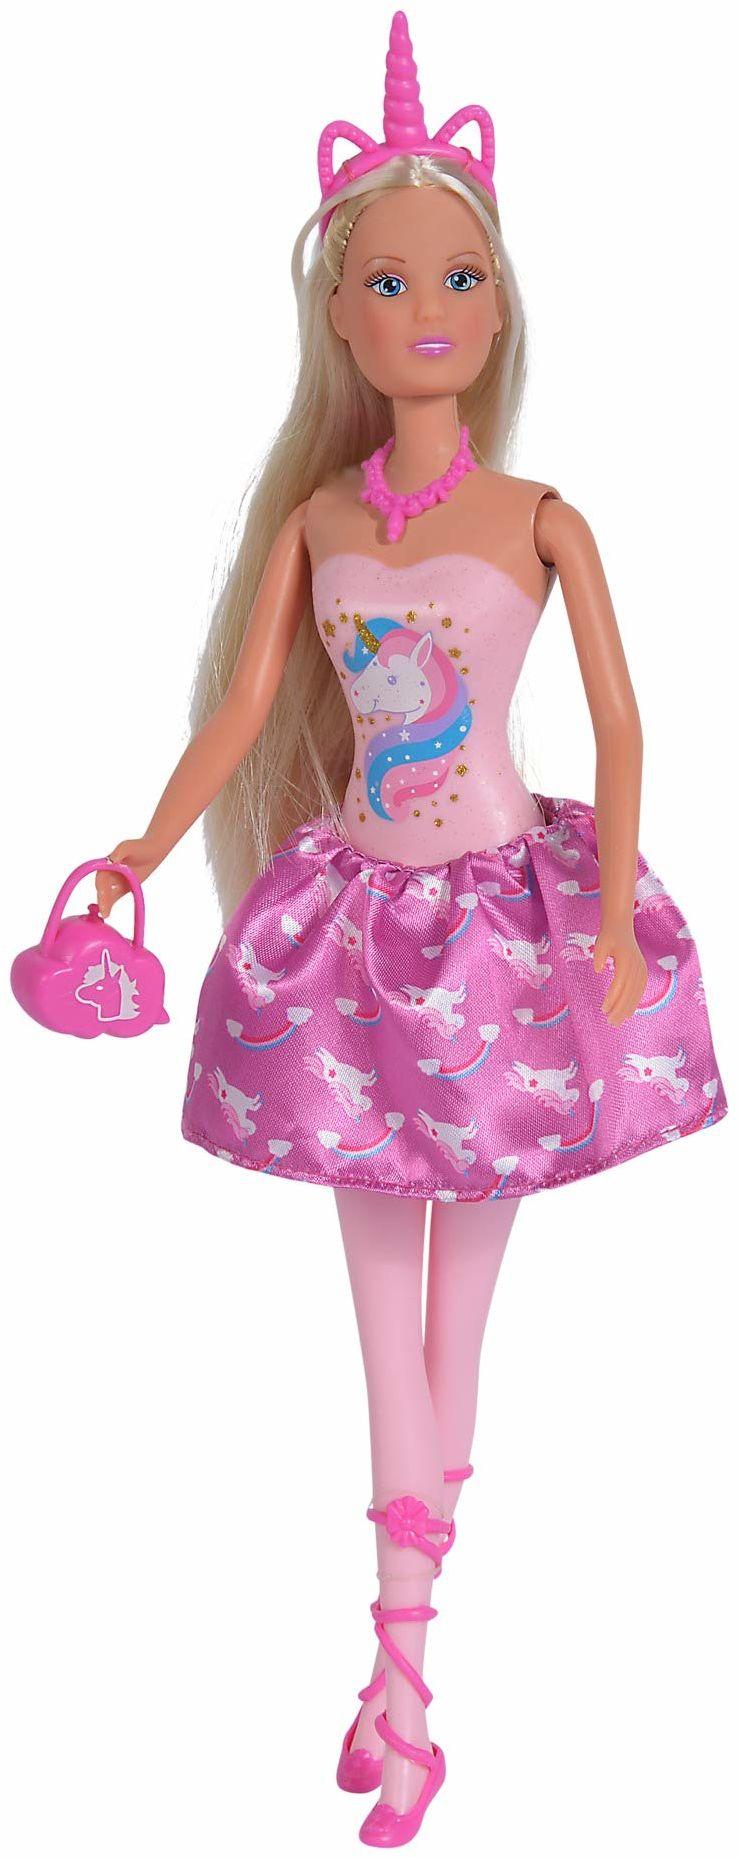 Simba 105733320 Steffi Love Fashion Unicorn